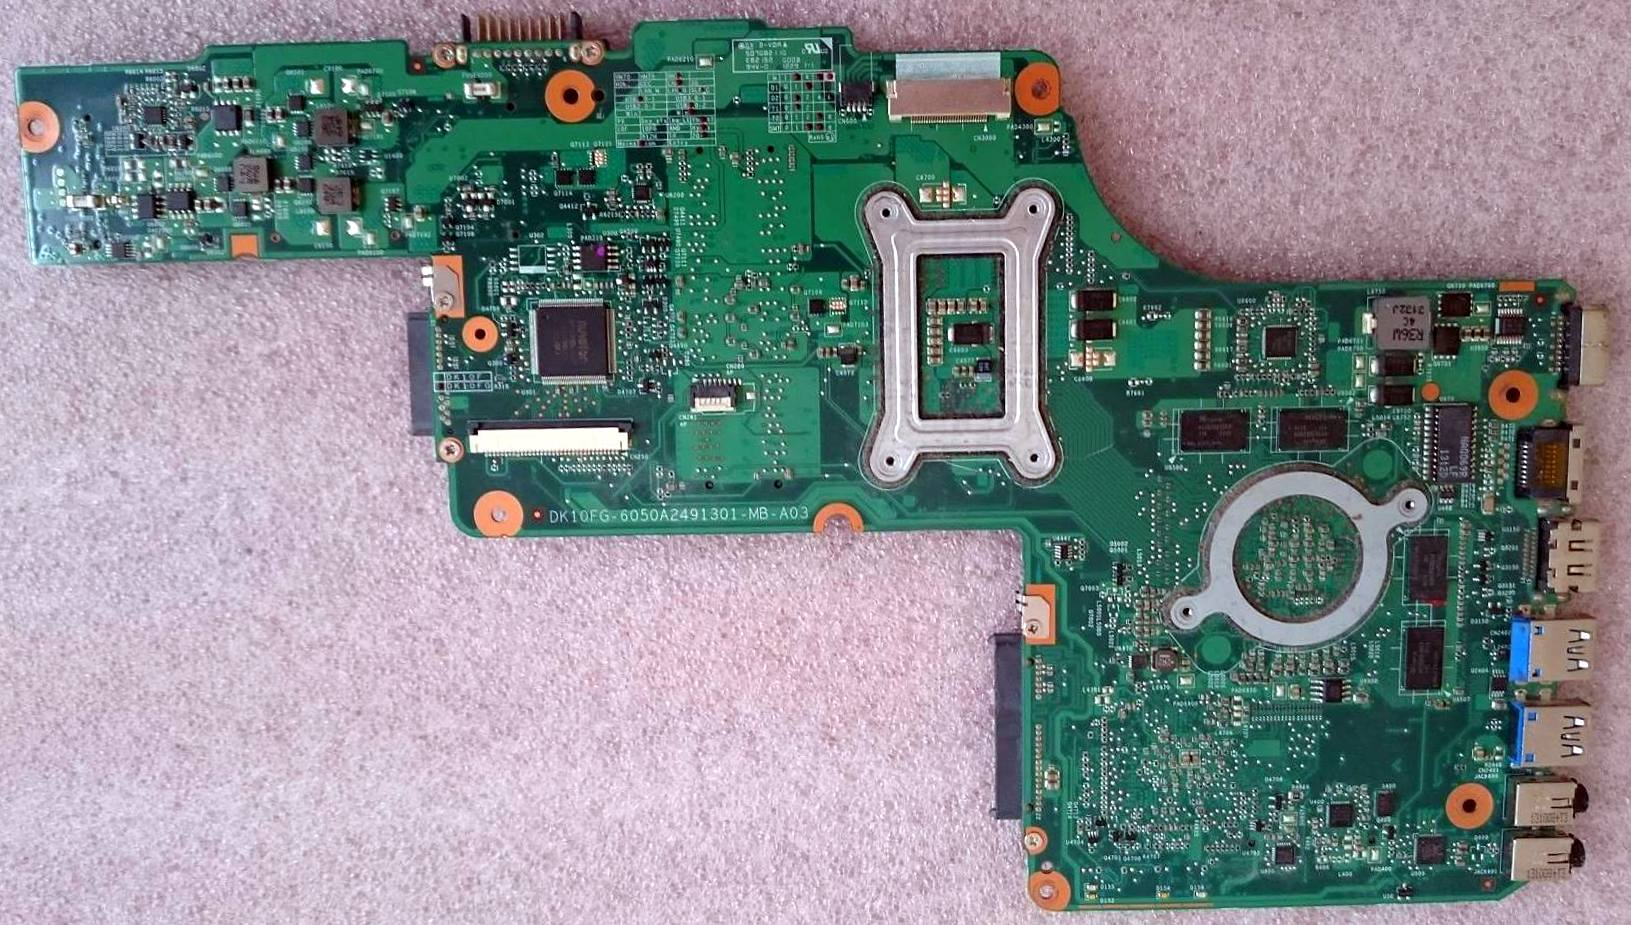 Toshiba Satellite L855-14f